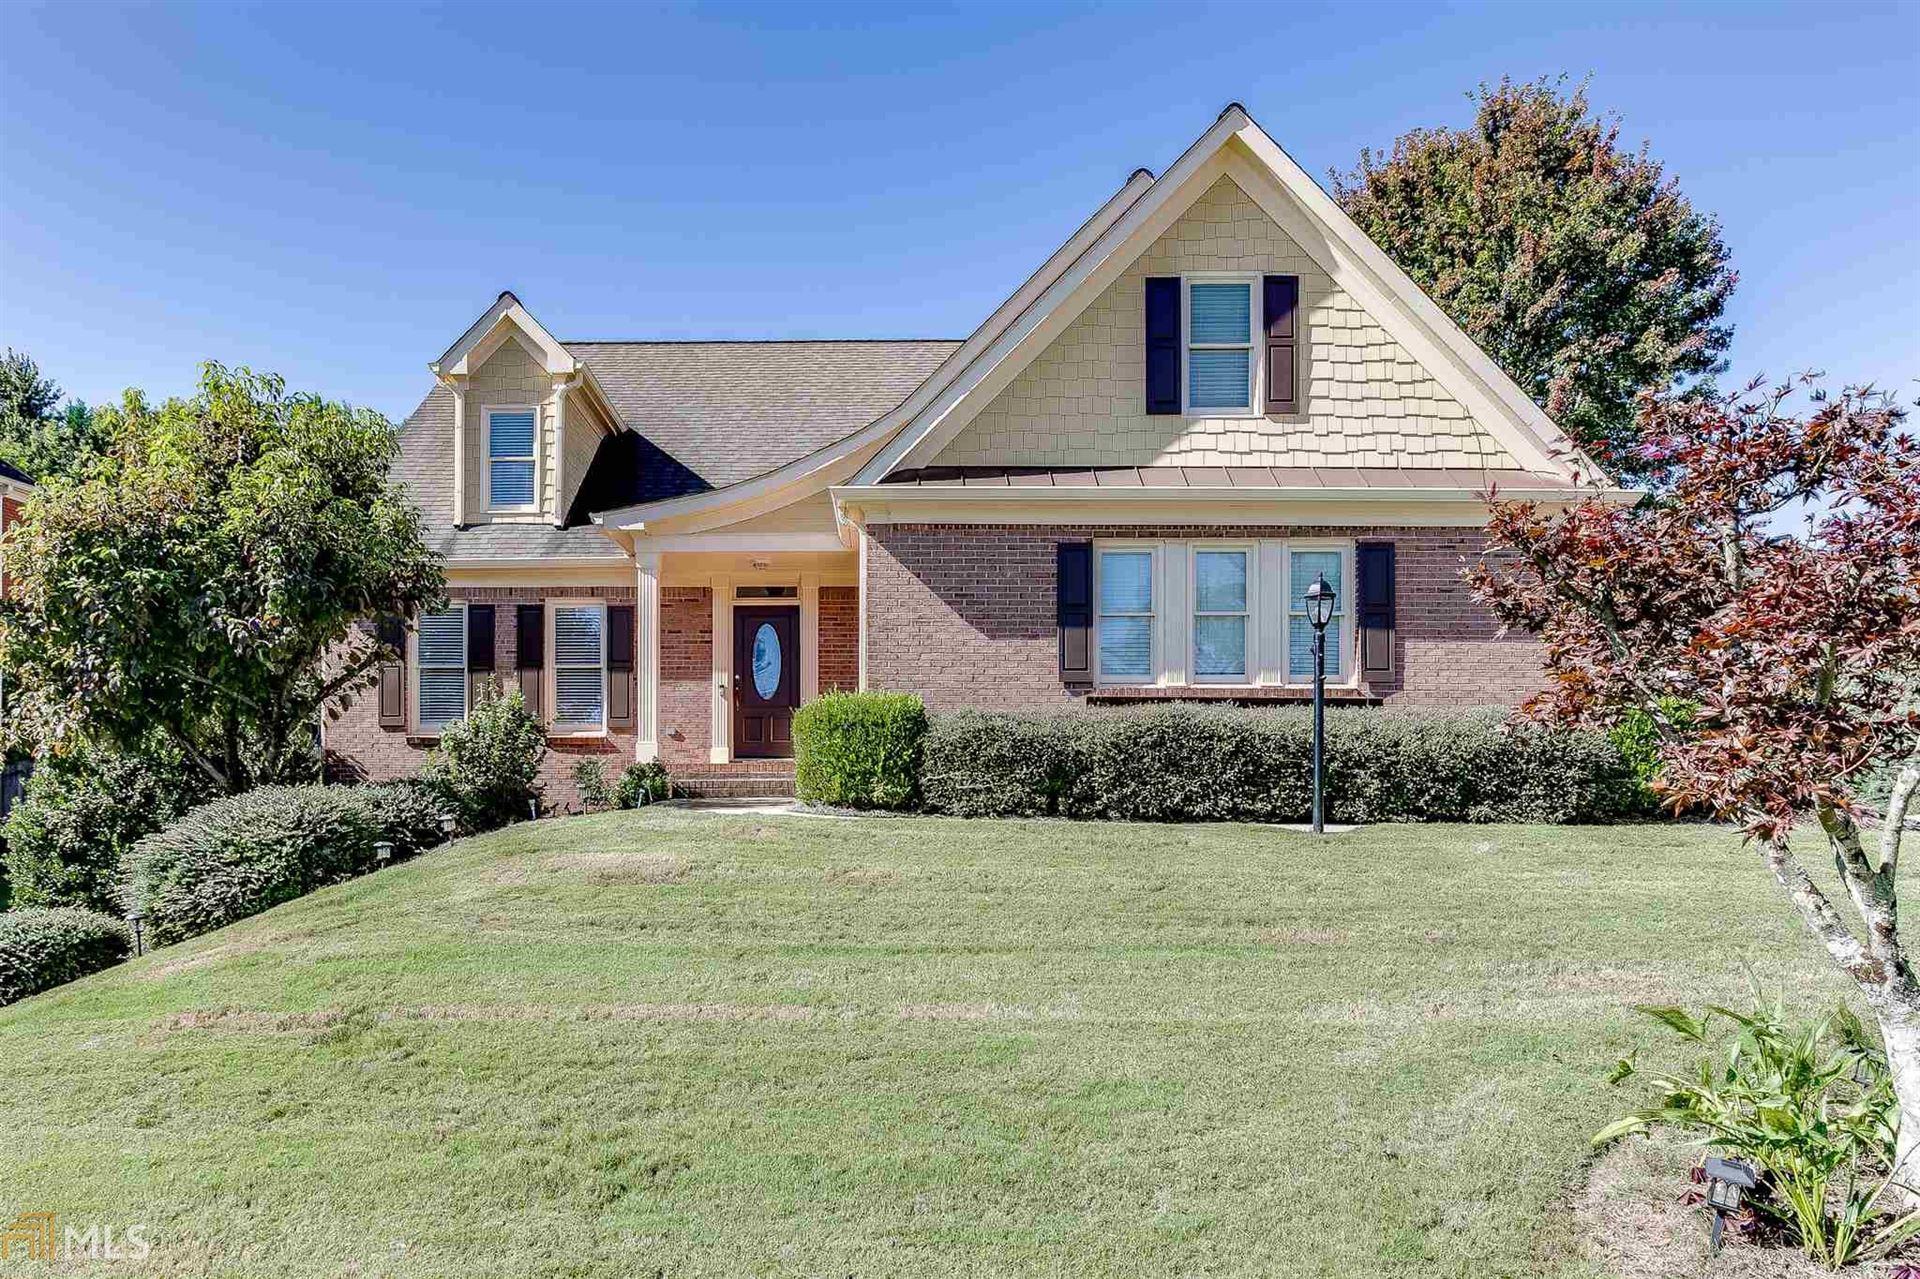 1685 Carlington Ct, Grayson, GA 30017 - MLS#: 8867129